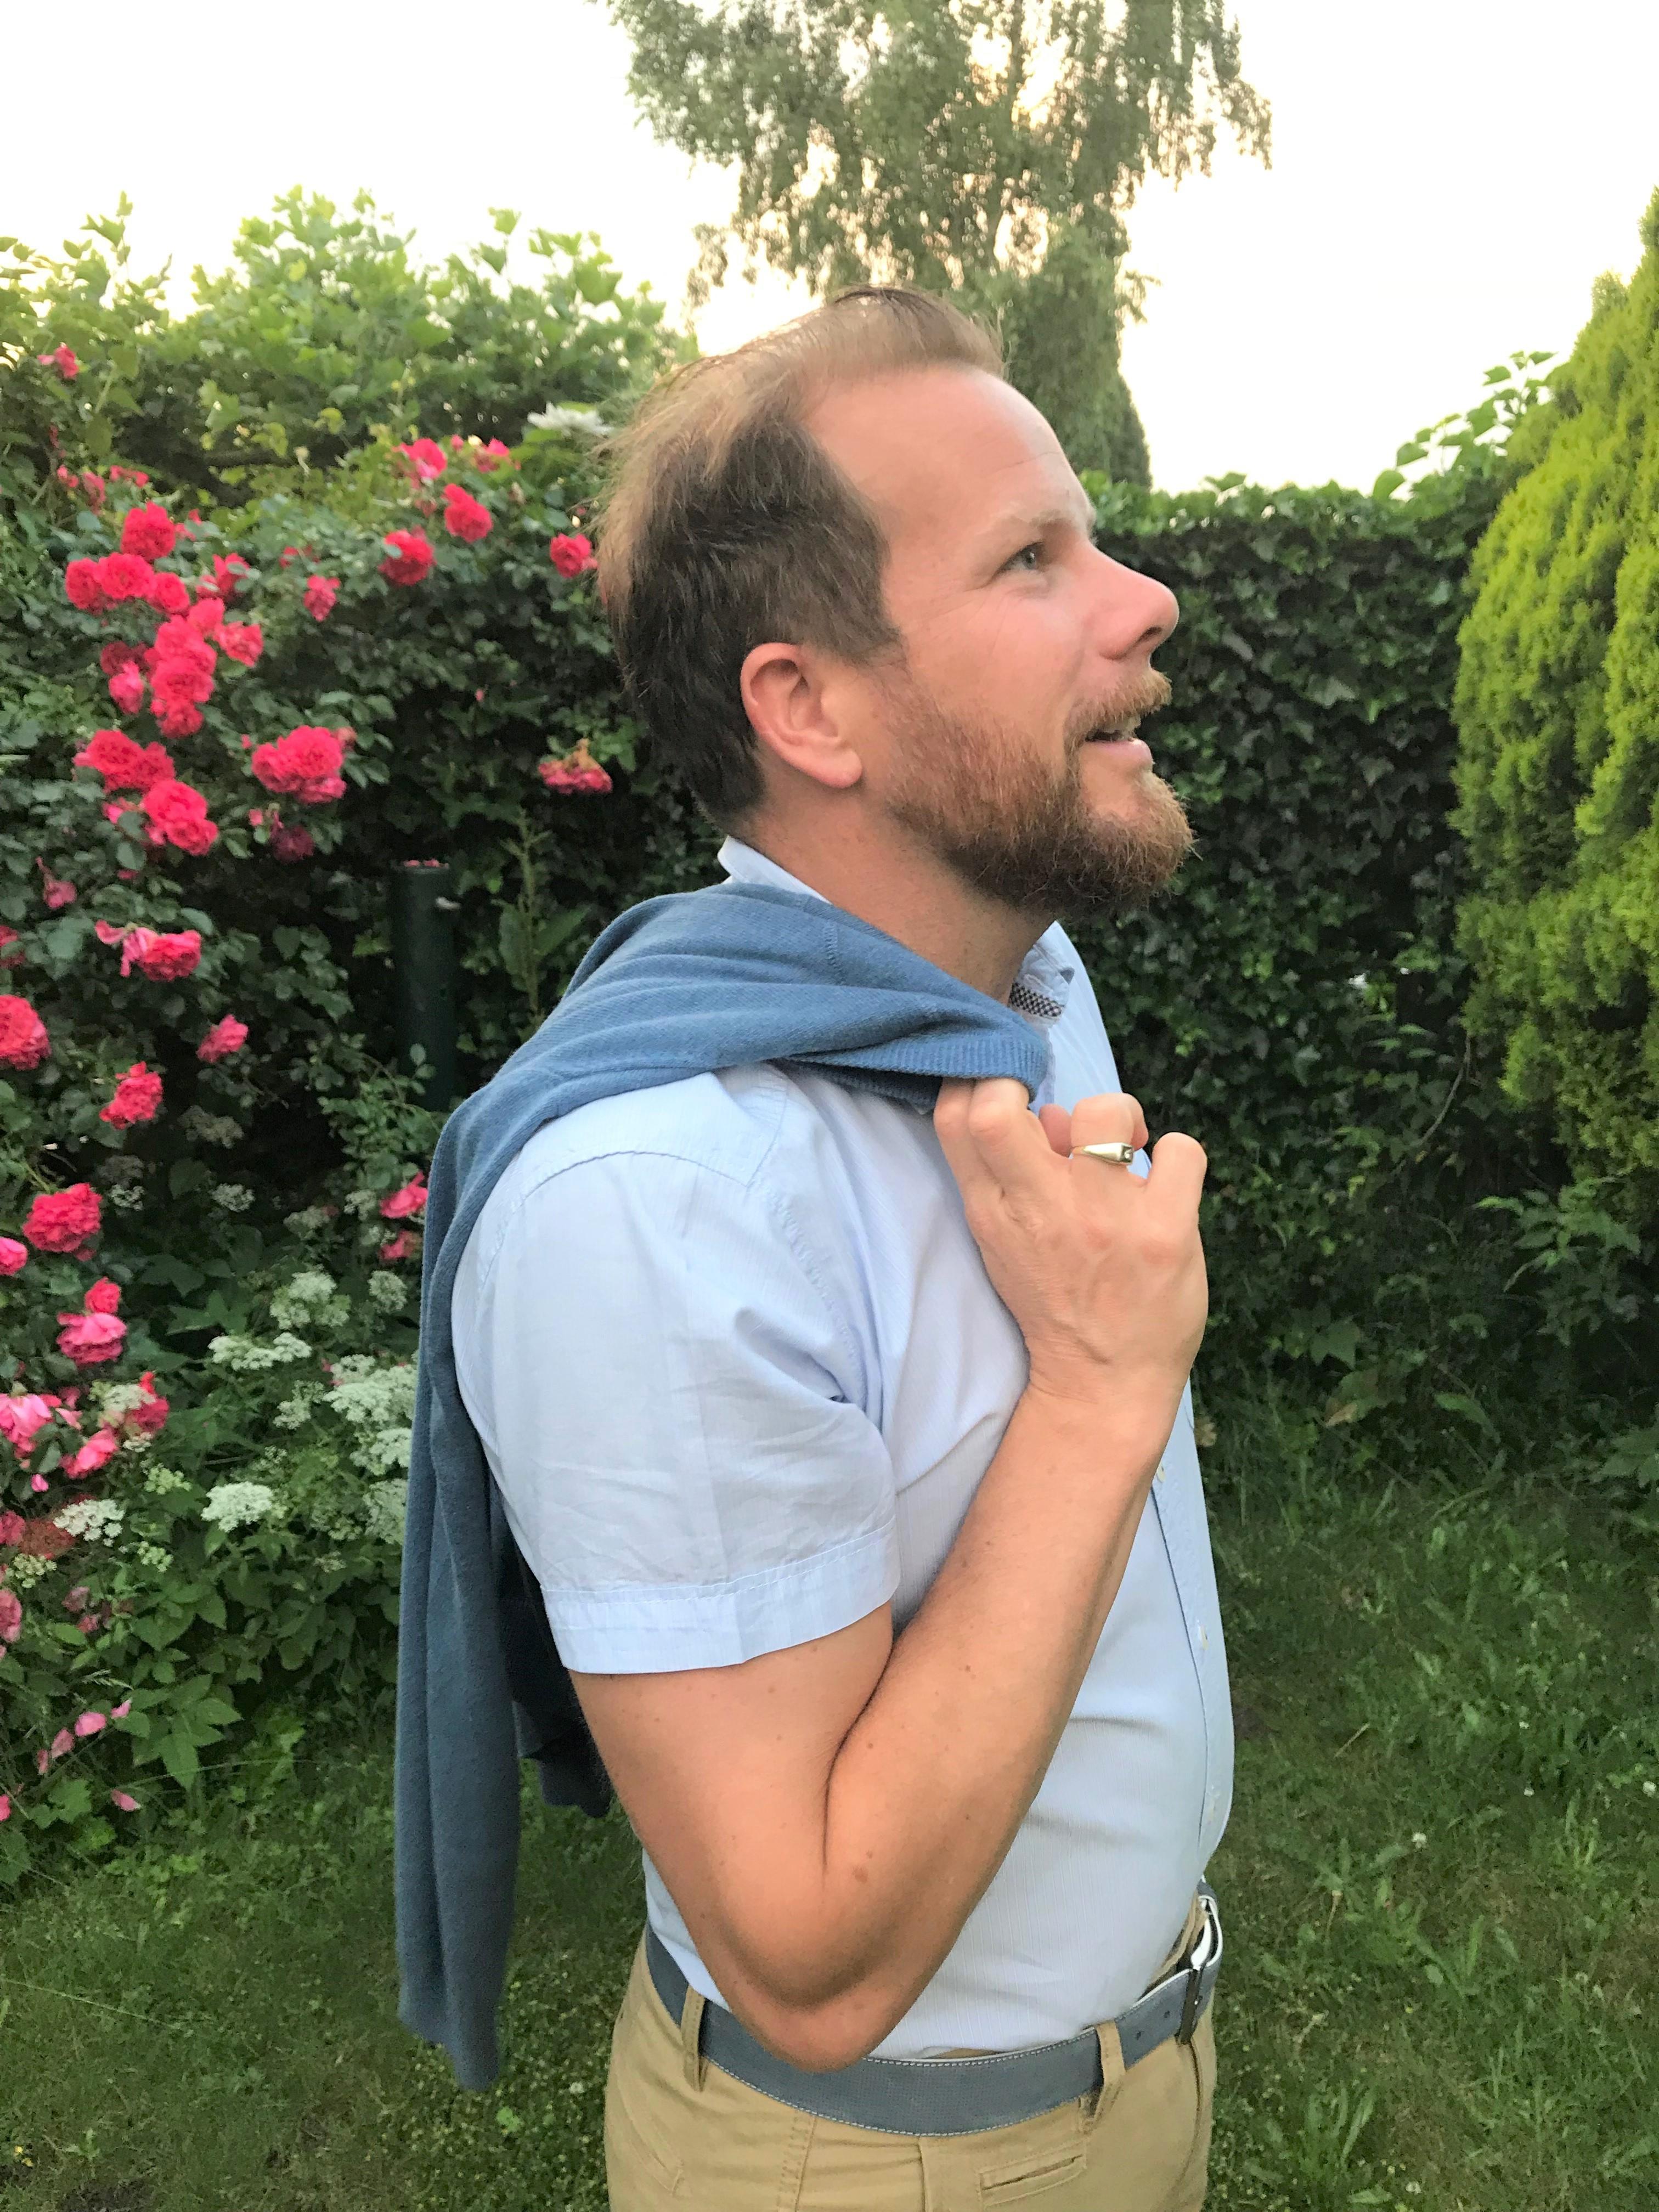 Wanneer je man van fotoshoot doet #hemdvoorhem